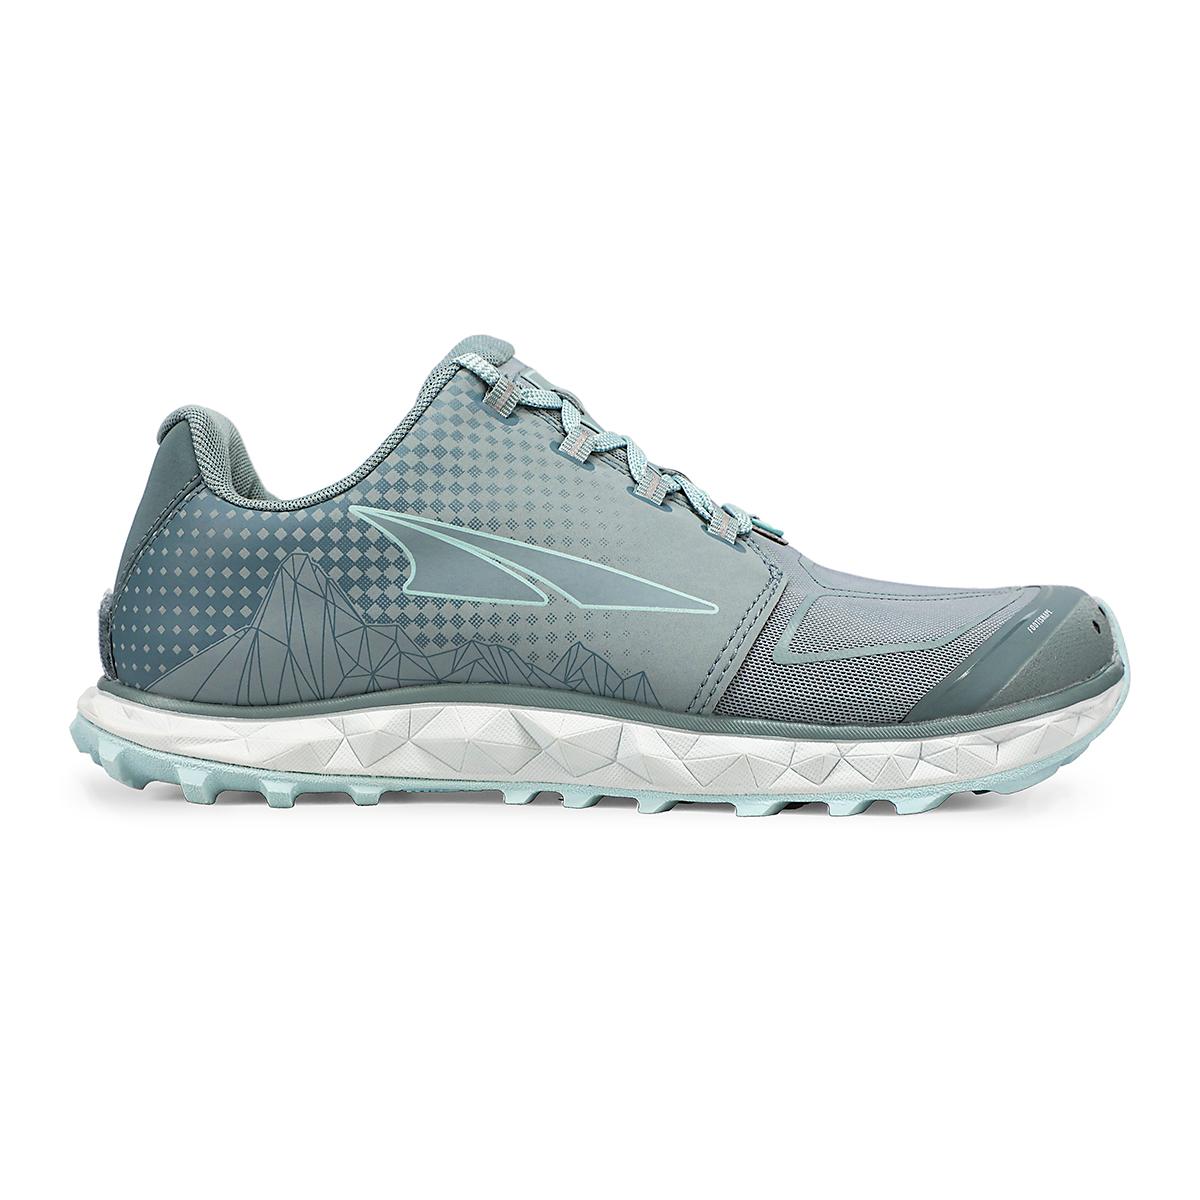 Women's Altra Superior 4.5 Trail Running Shoe - Color: Light Blue - Size: 5.5 - Width: Regular, Light Blue, large, image 1